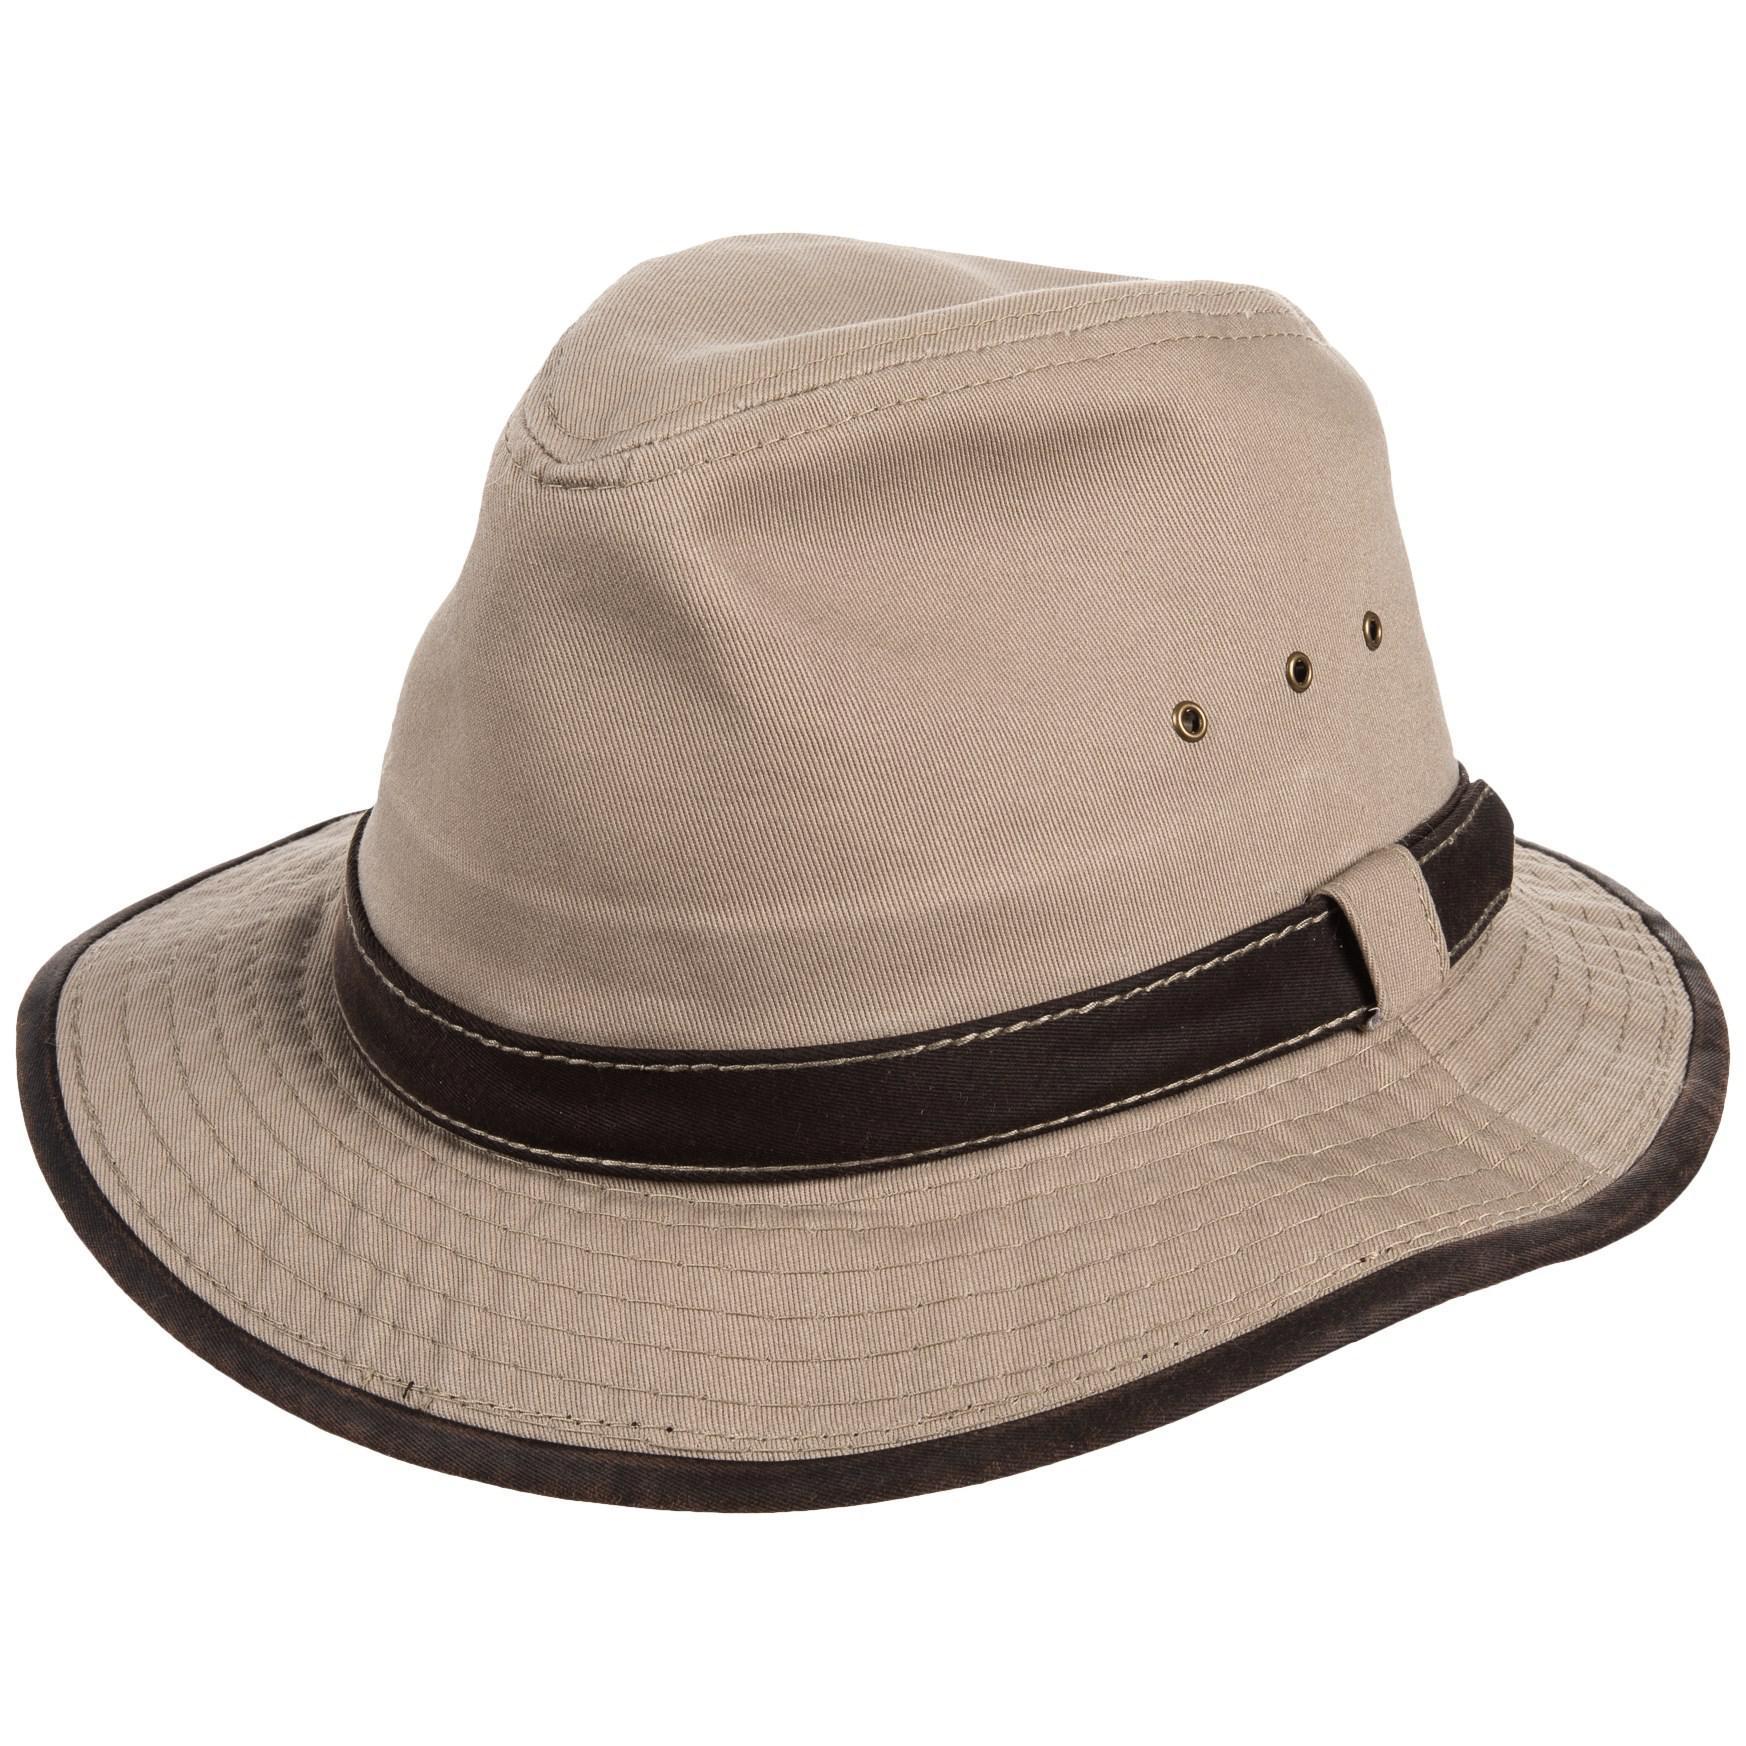 504671622db030 Dorfman Pacific Garment-washed Twill Safari Hat in Natural for Men ...